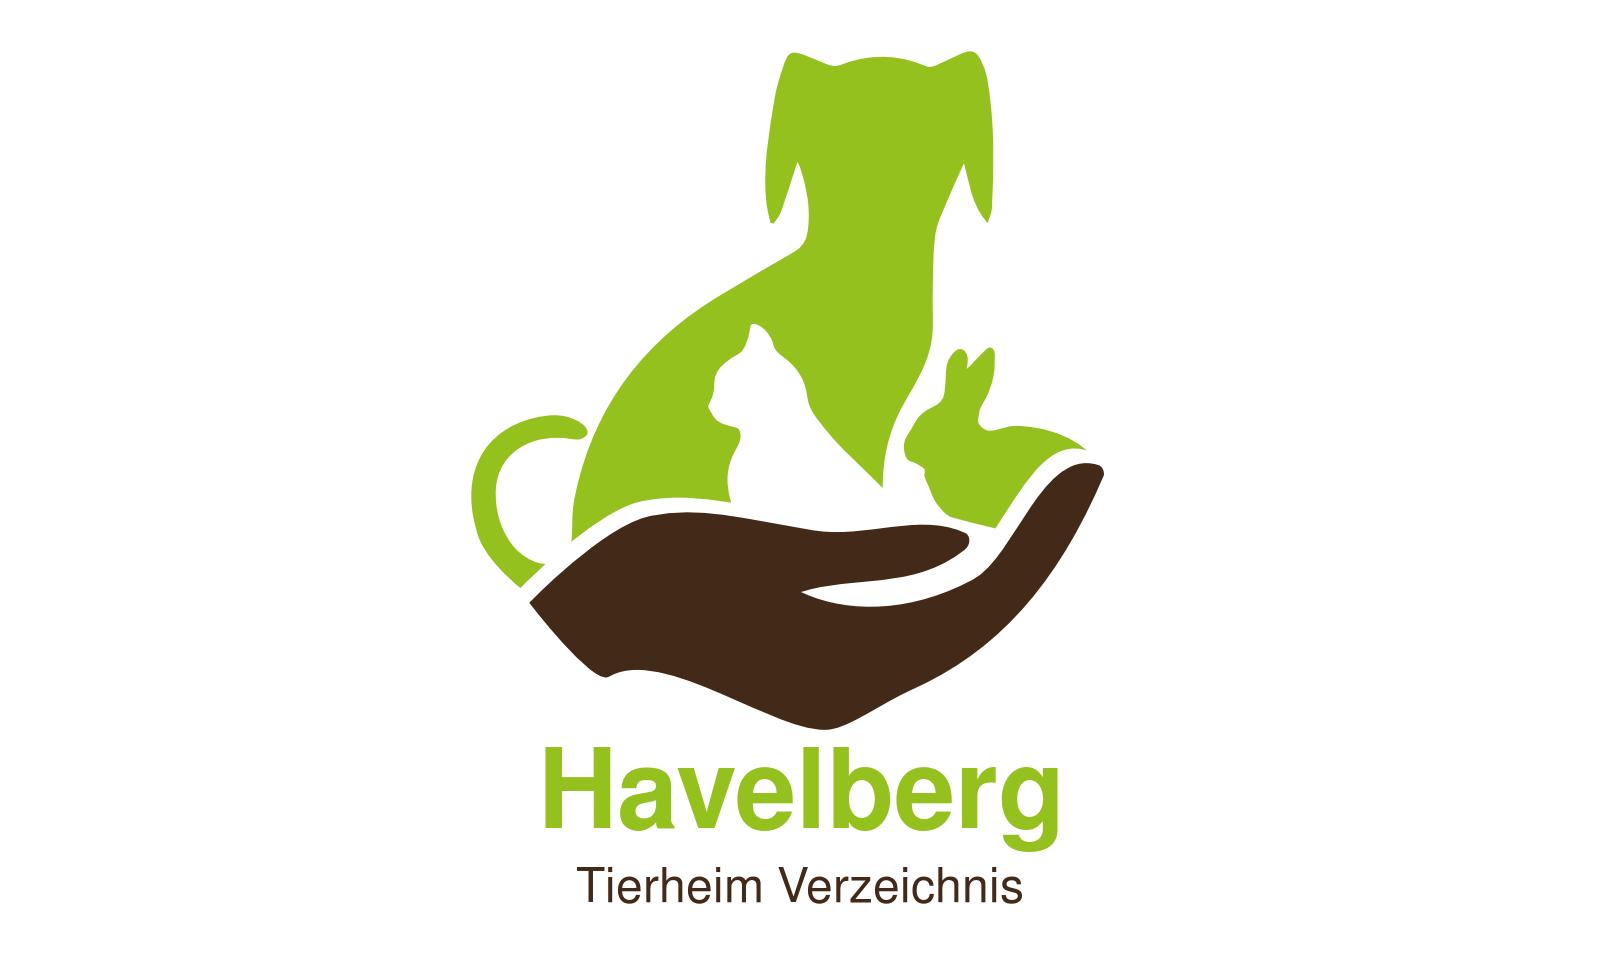 Tierheim Havelberg